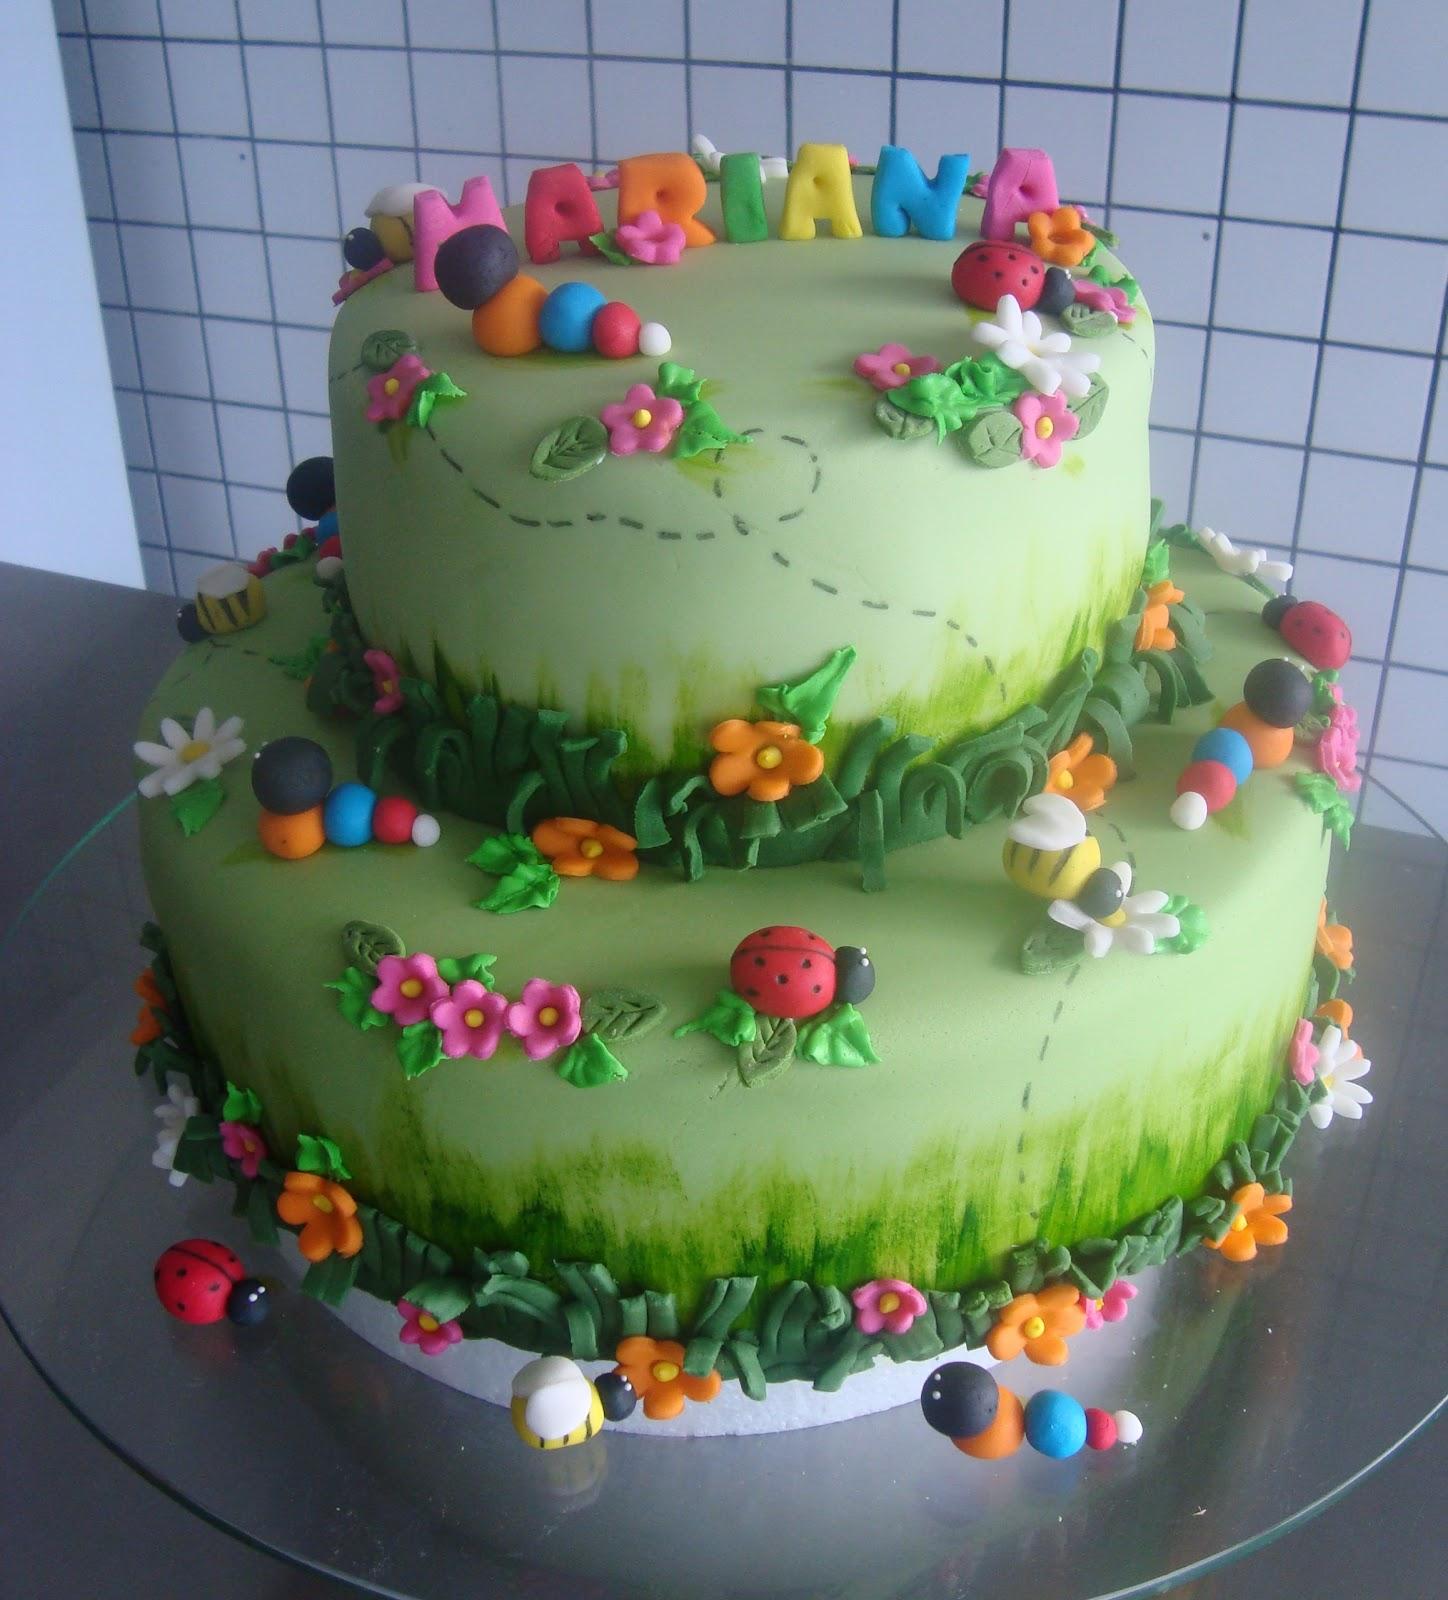 Vivi Costa cake designer Jardim encantado